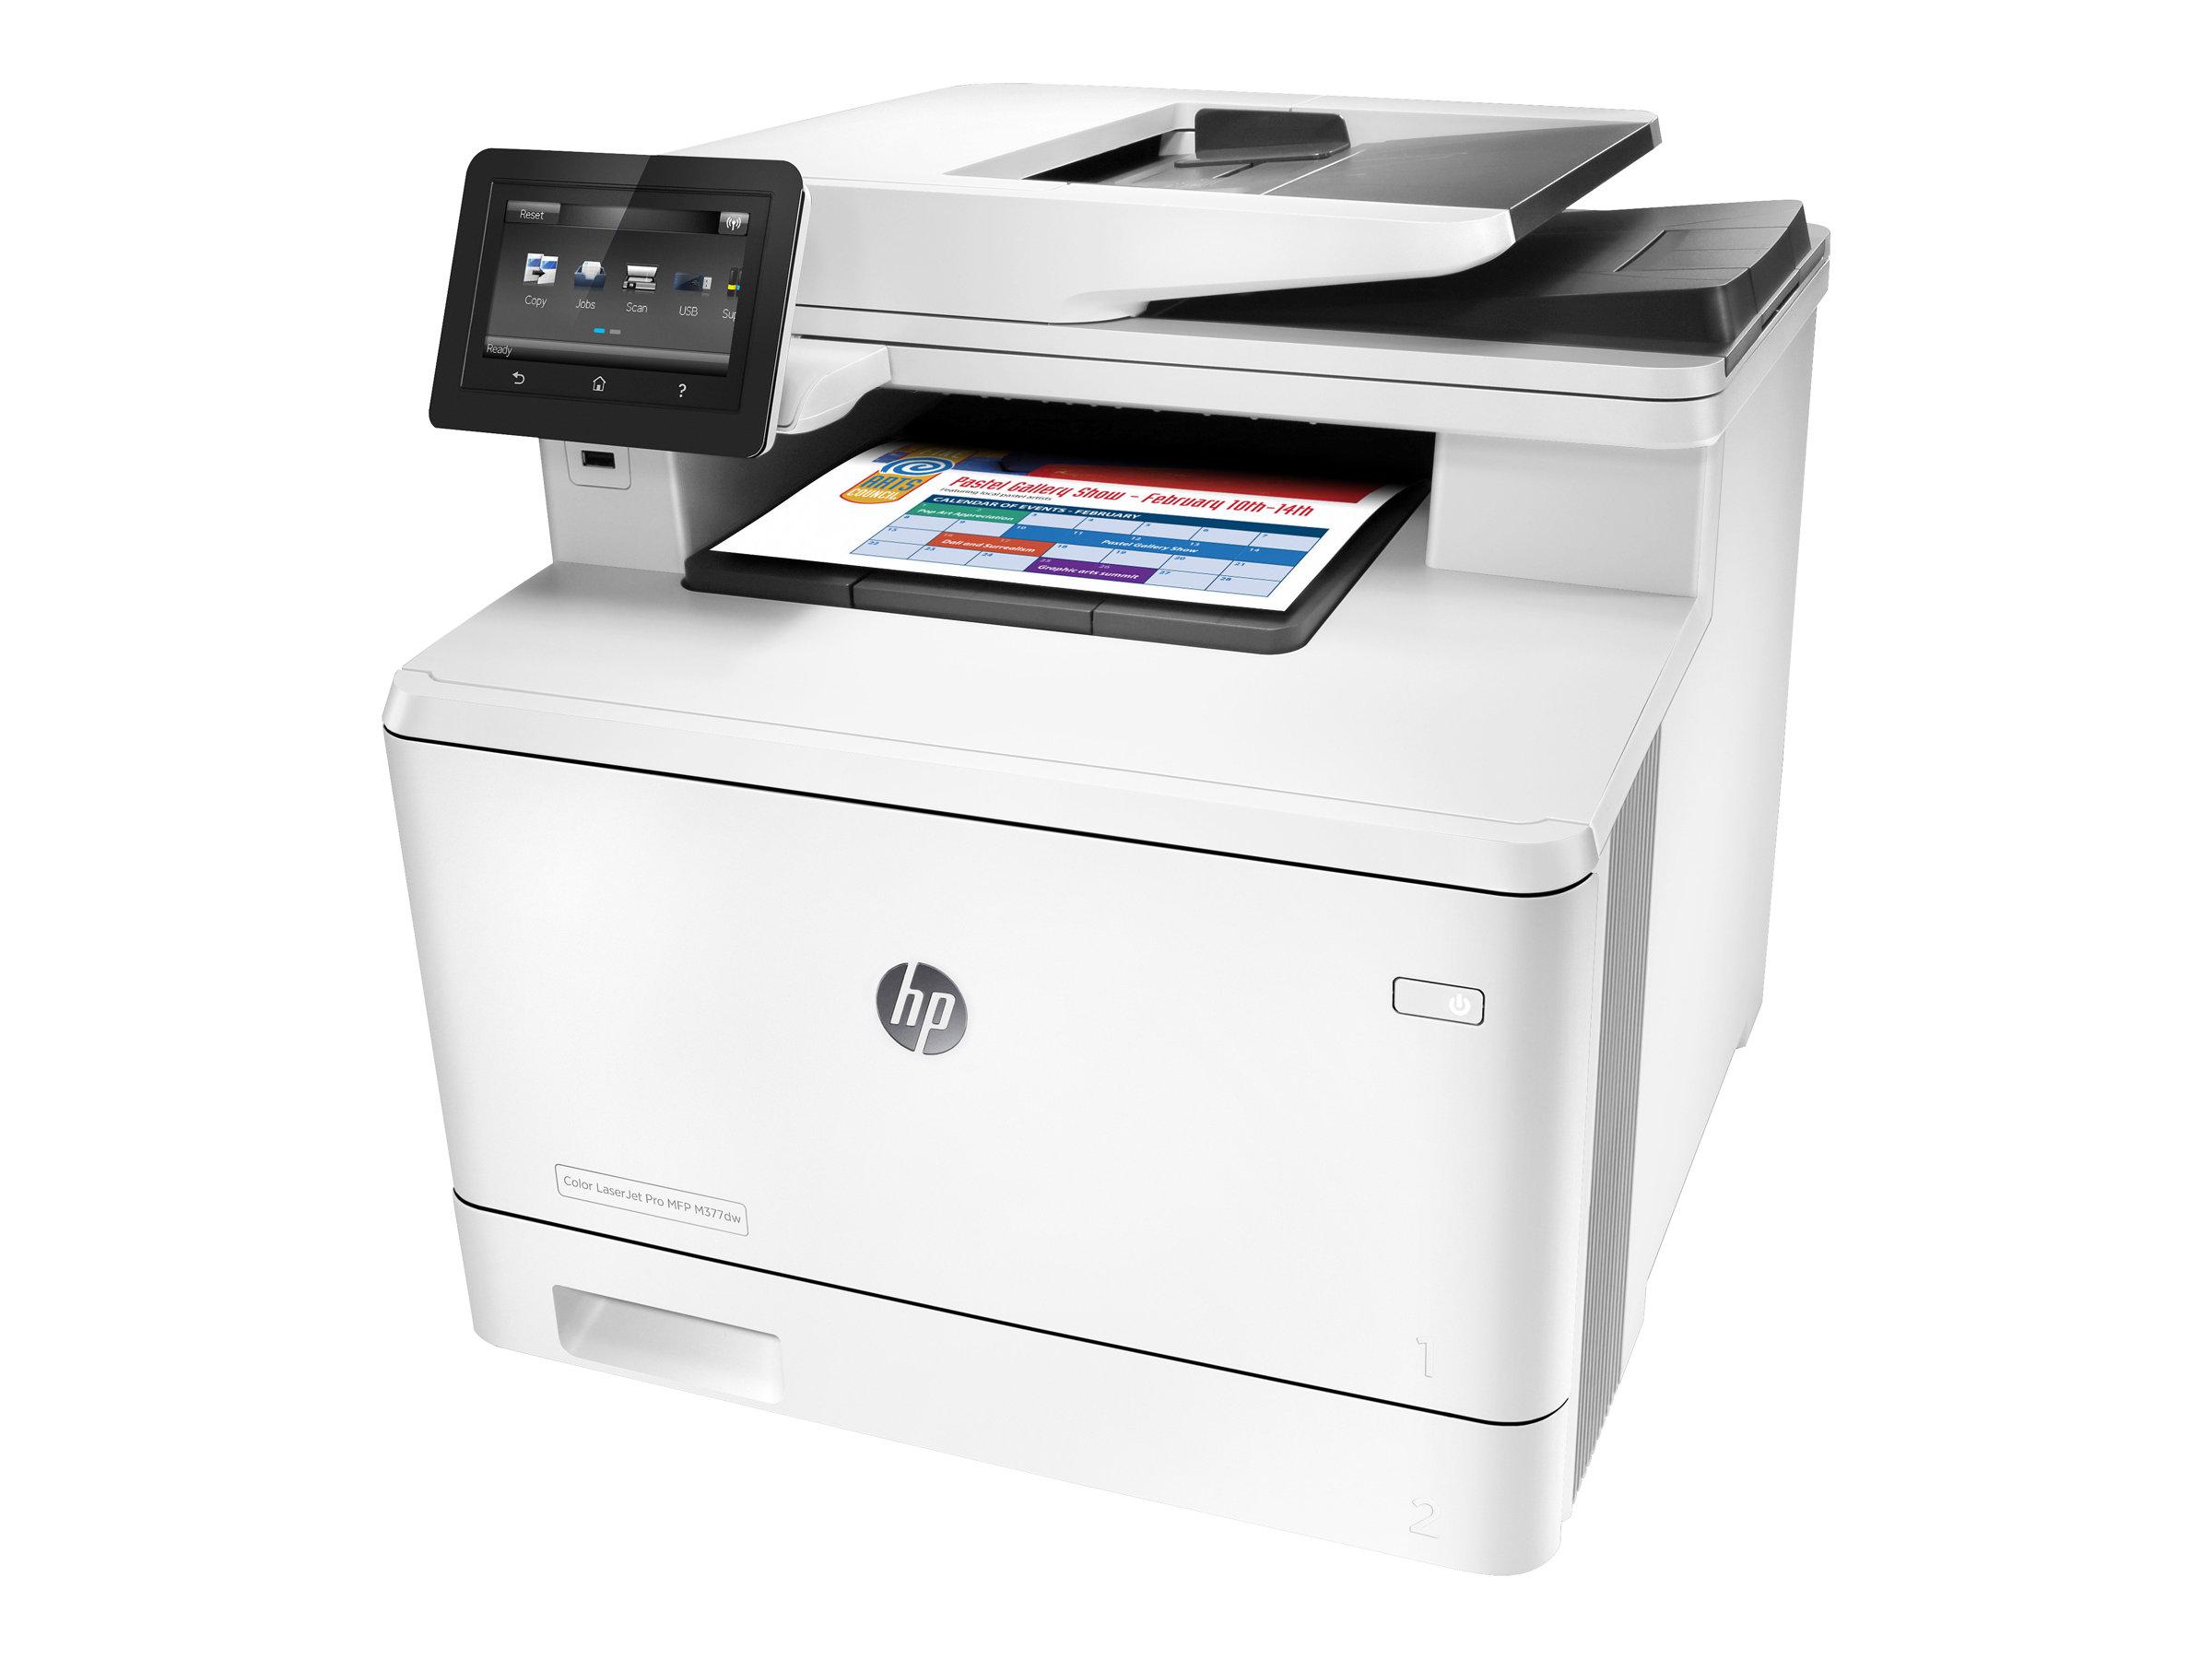 HP Color LaserJet Pro MFP M377dw - Multifunktionsdrucker - Farbe - Laser - Legal (216 x 356 mm) (Original) - A4/Legal (Medien)